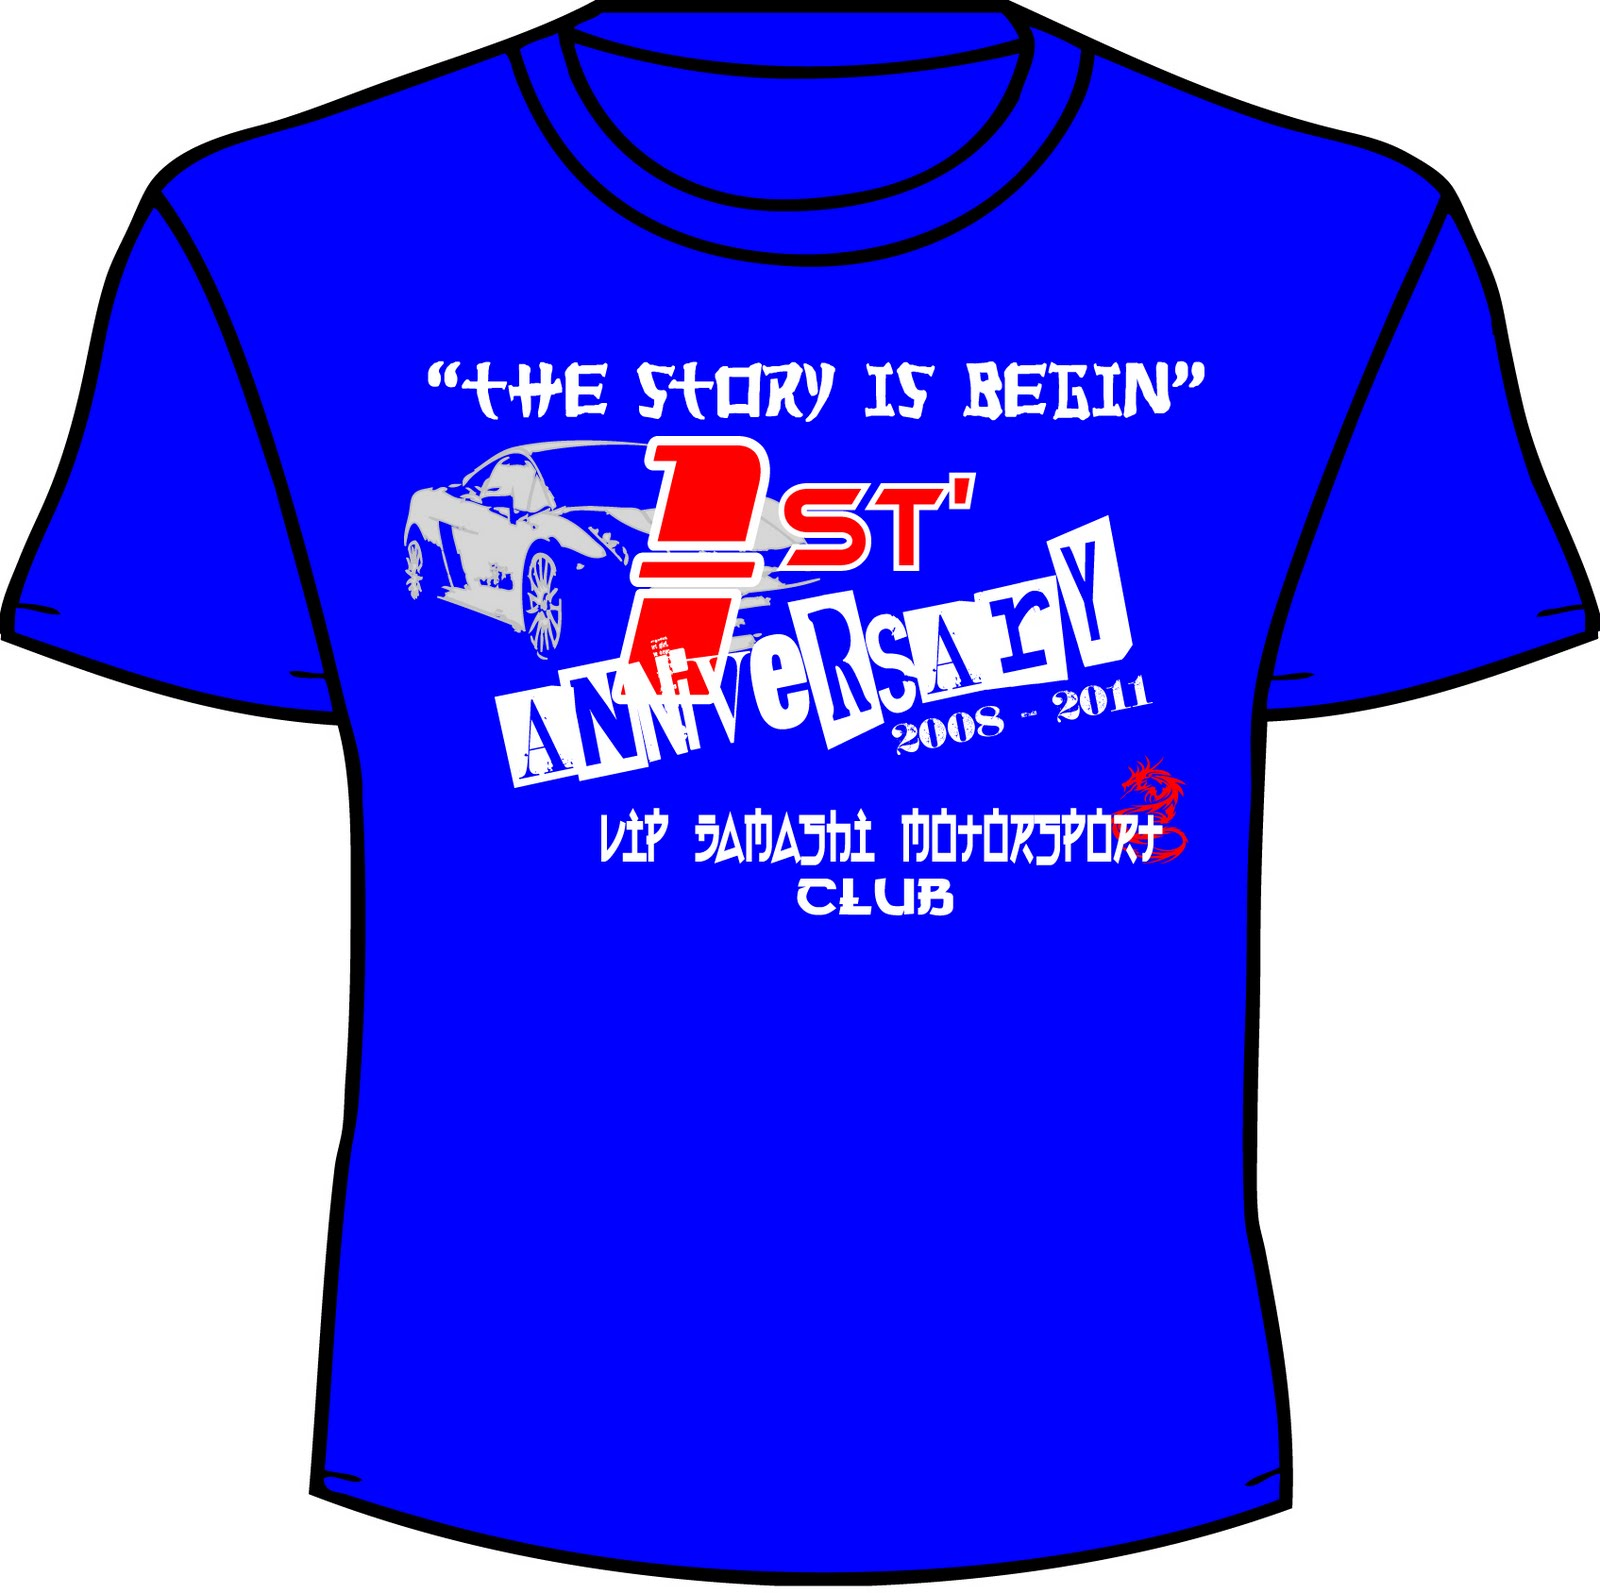 Shirt design printing - T Shirt Designs Artwork T Shirt Printing